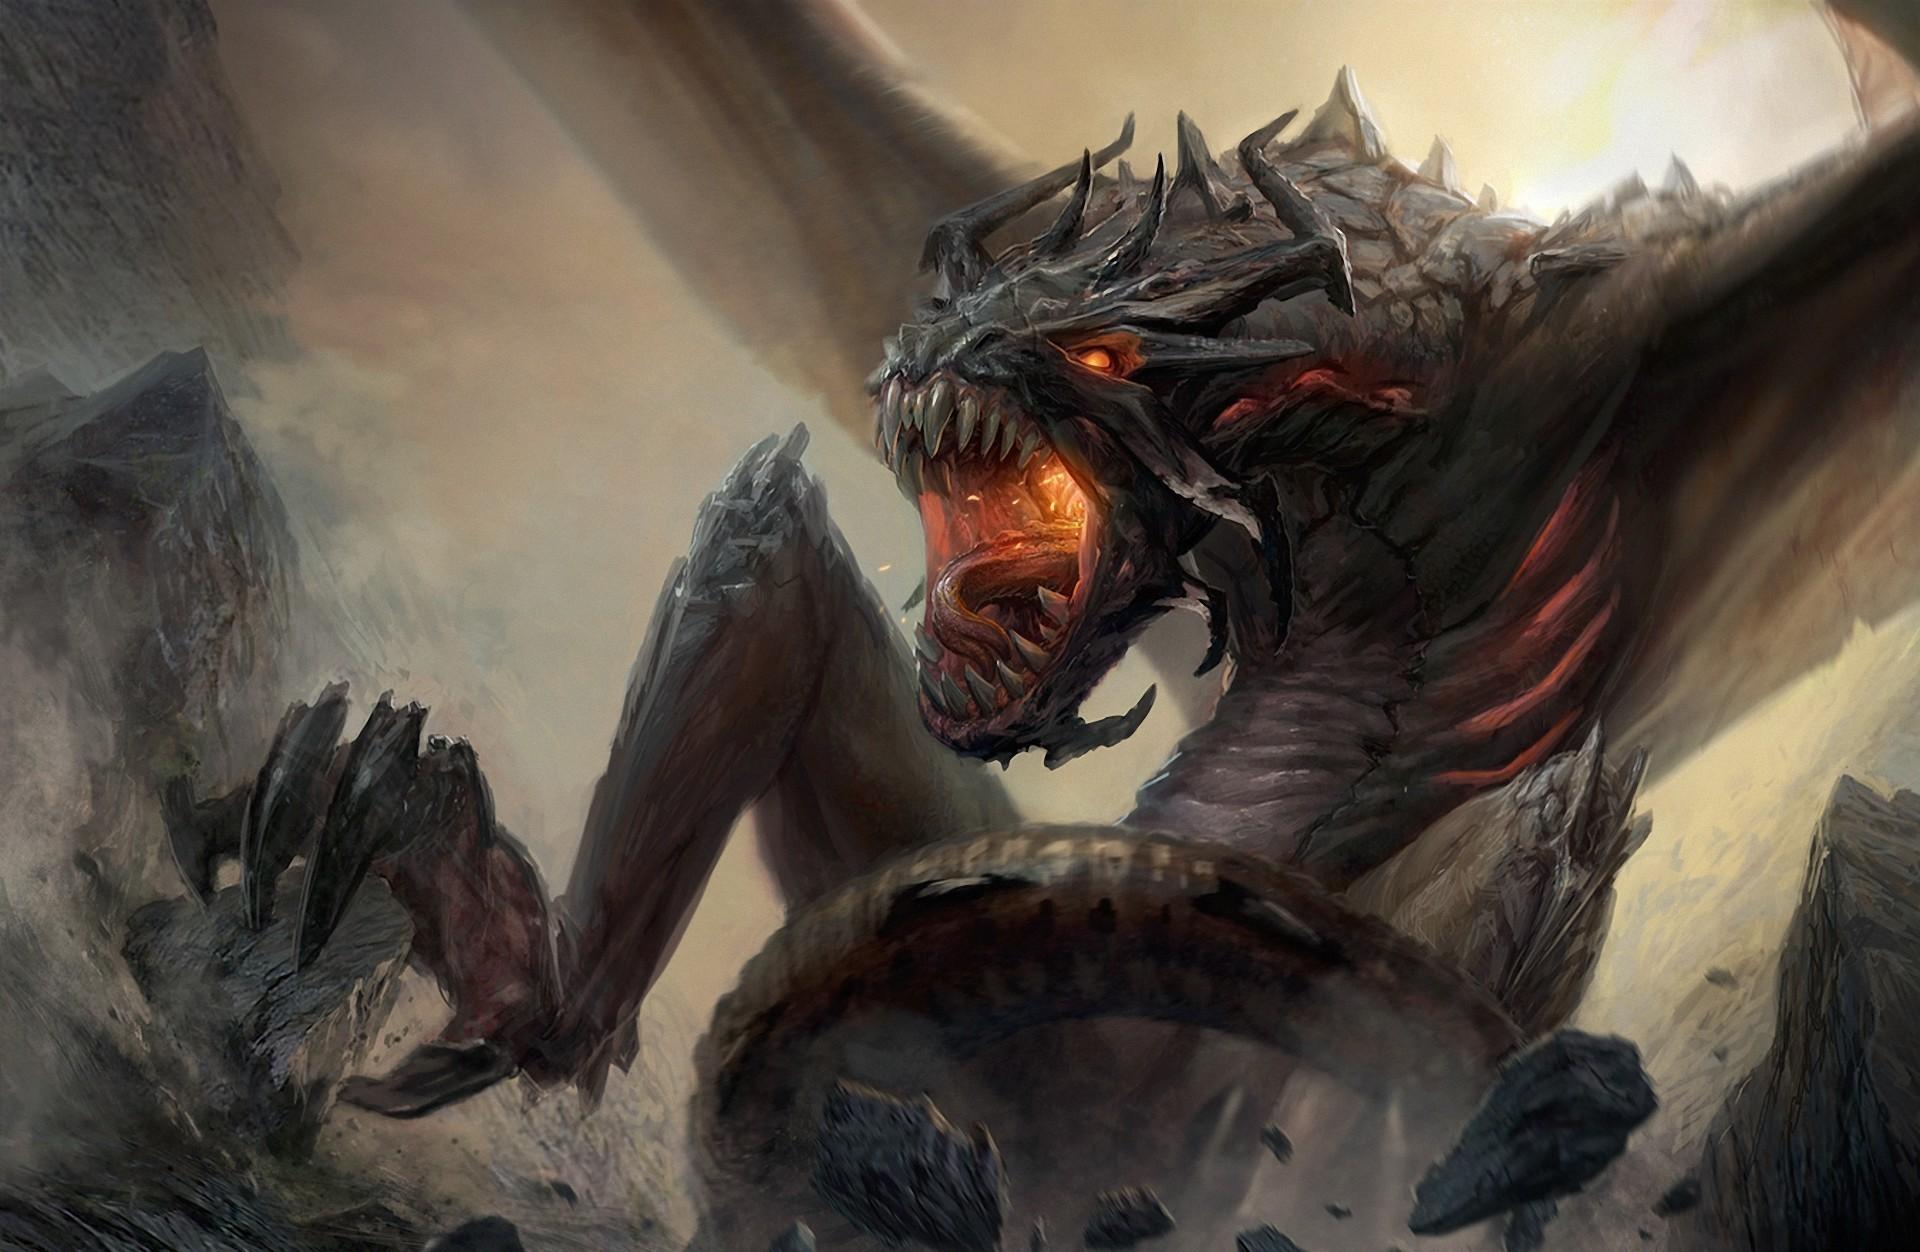 Гнев титанов, монст, Химера  № 1524139 без смс